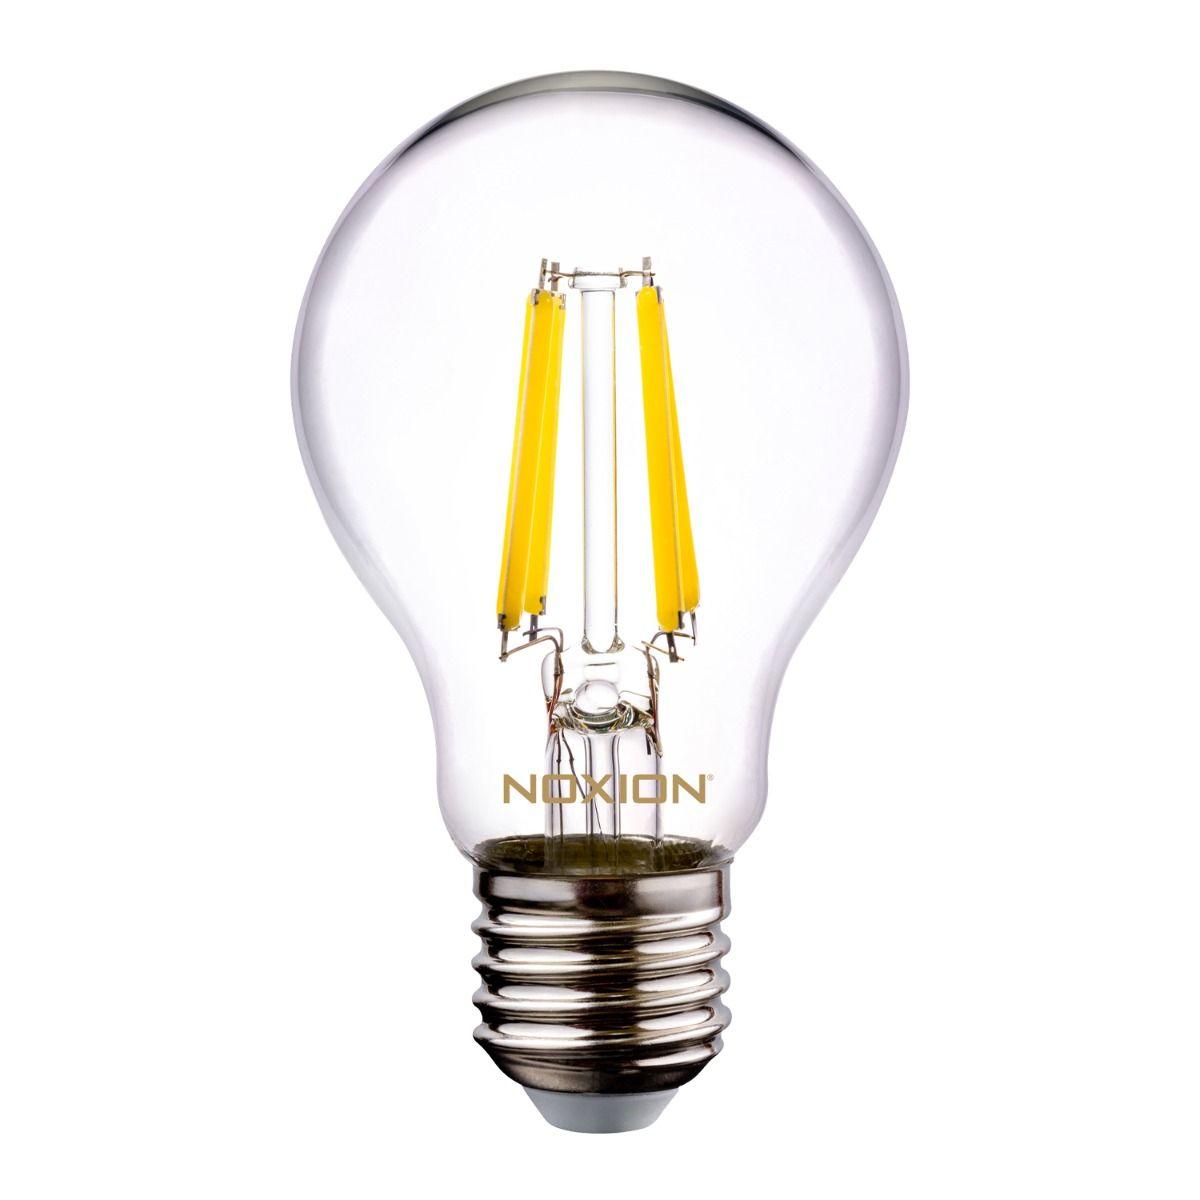 Noxion Lucent Gloeilamp LED Bulb A60 E27 220-240V 4.5W 470LM CRI80 4000K ND (40W eqv.)